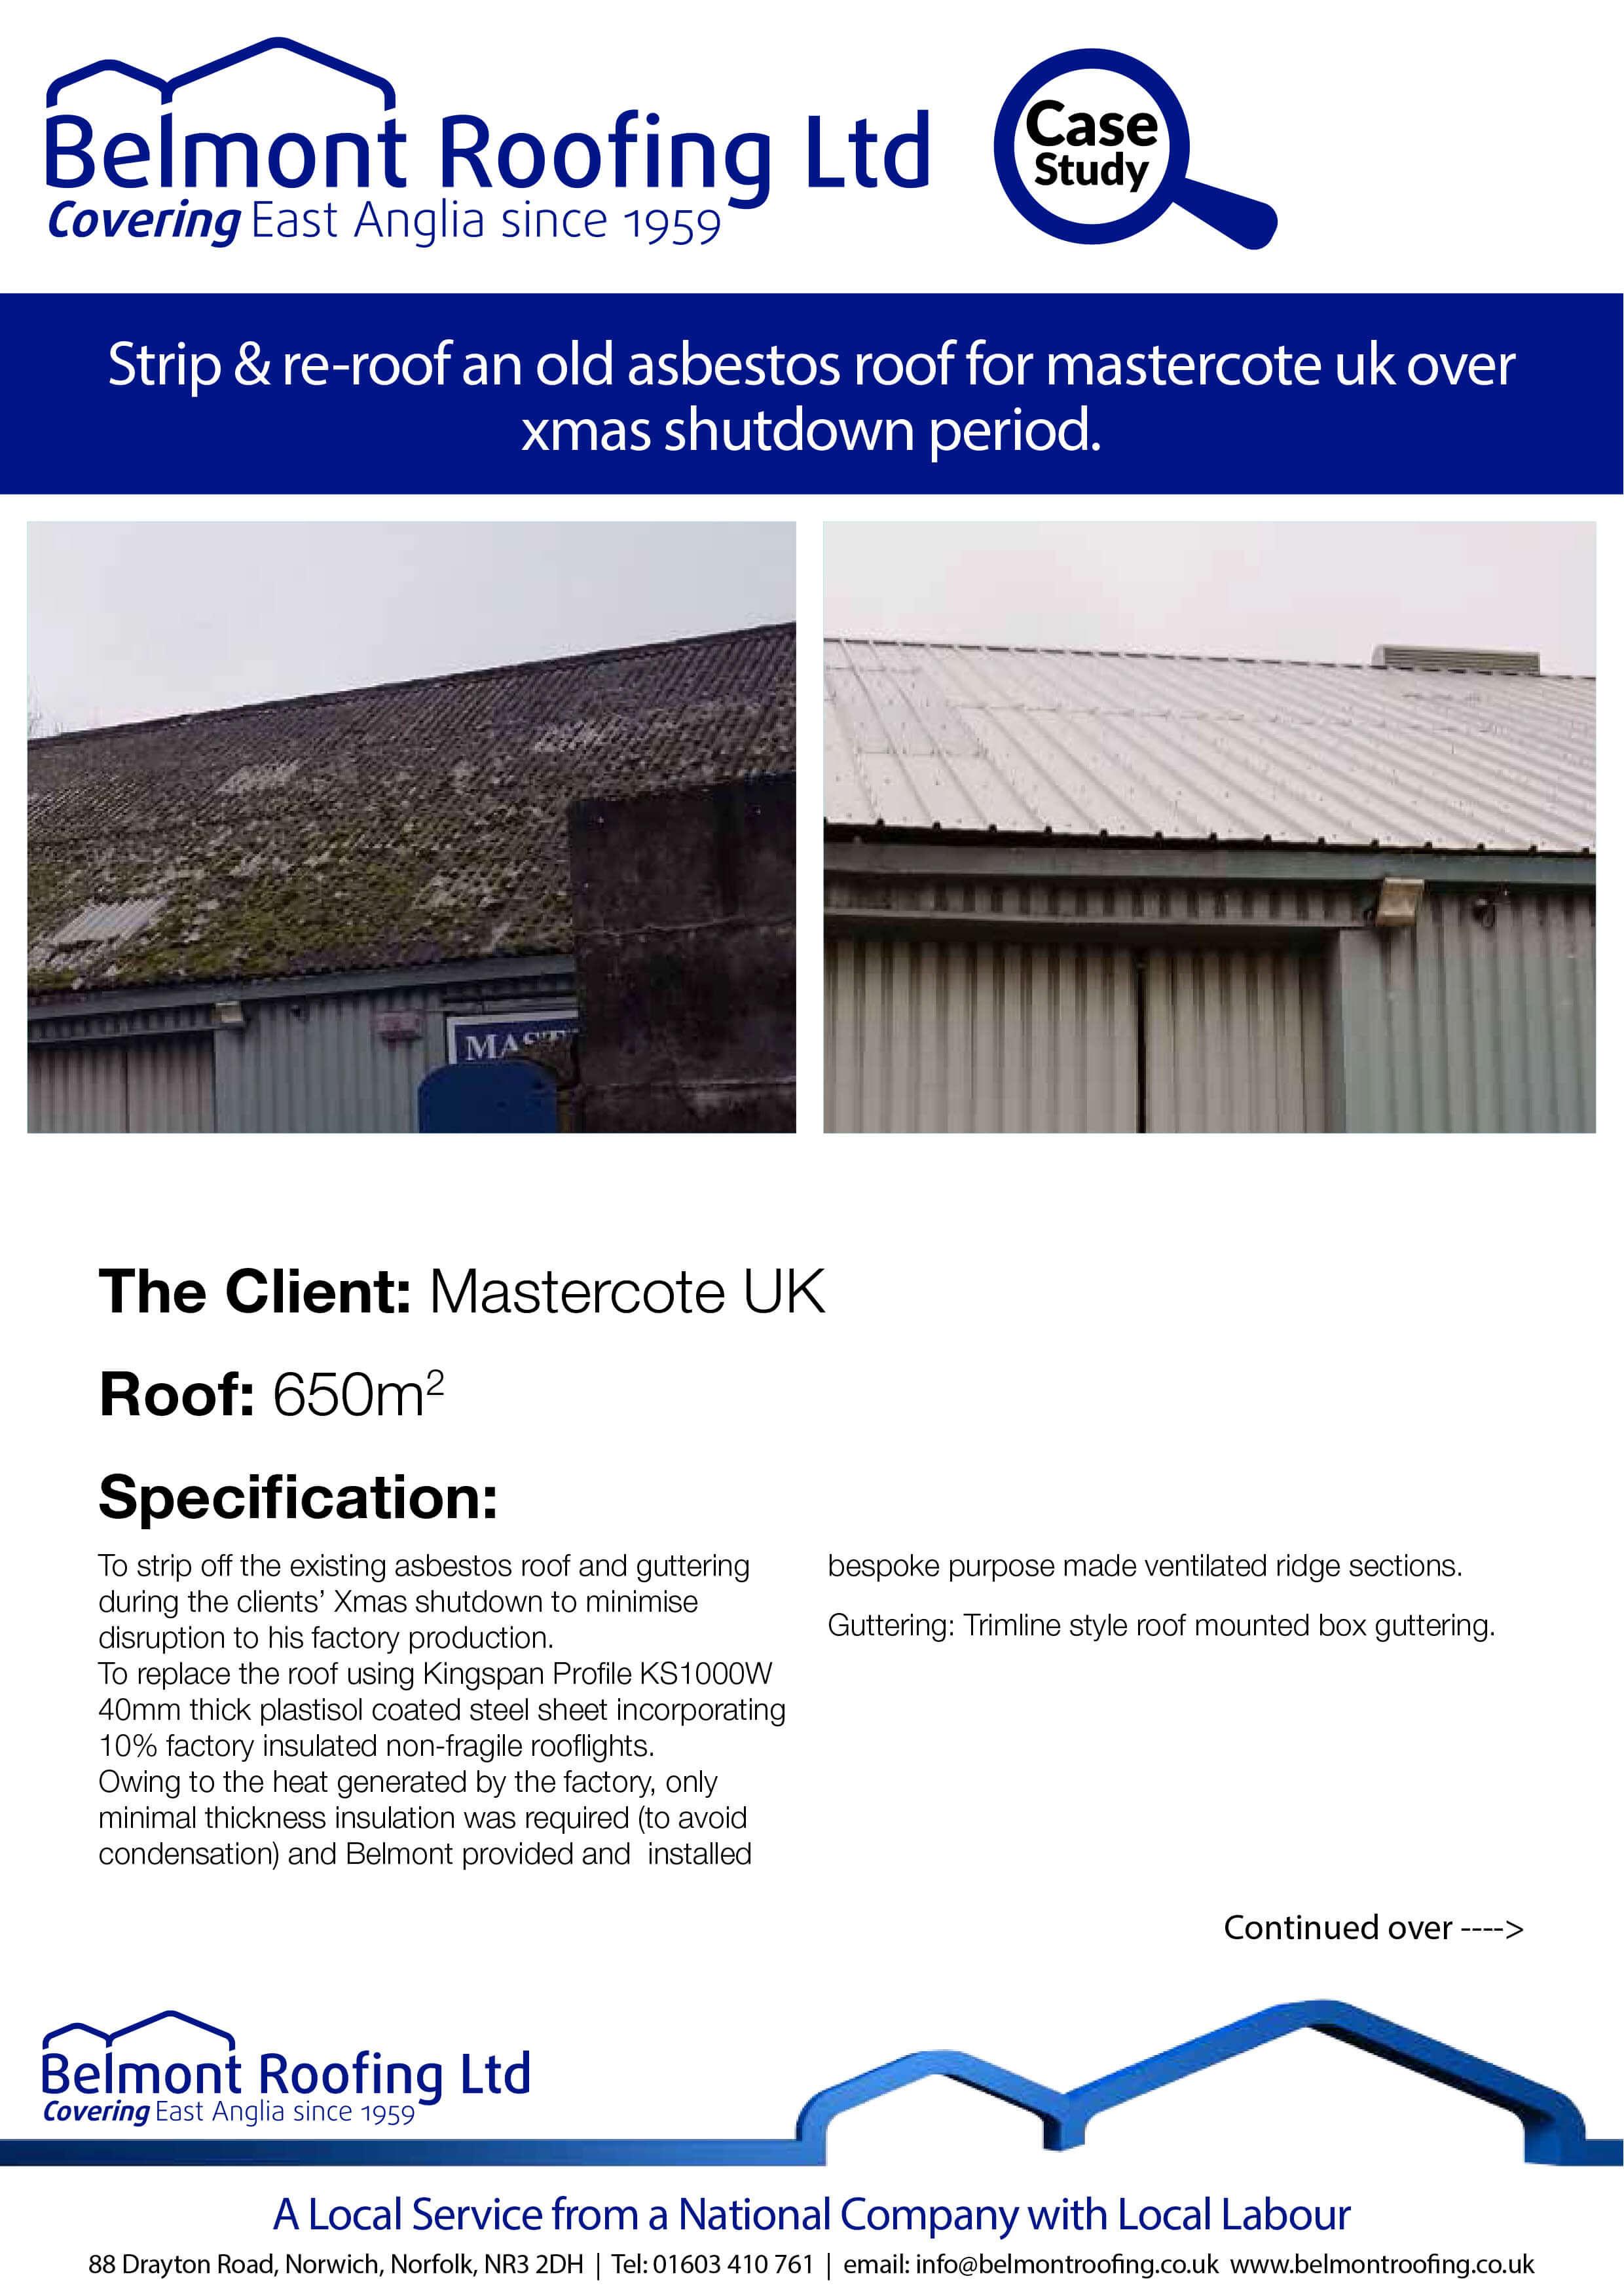 Belmont Roofing Mastercote UK 1